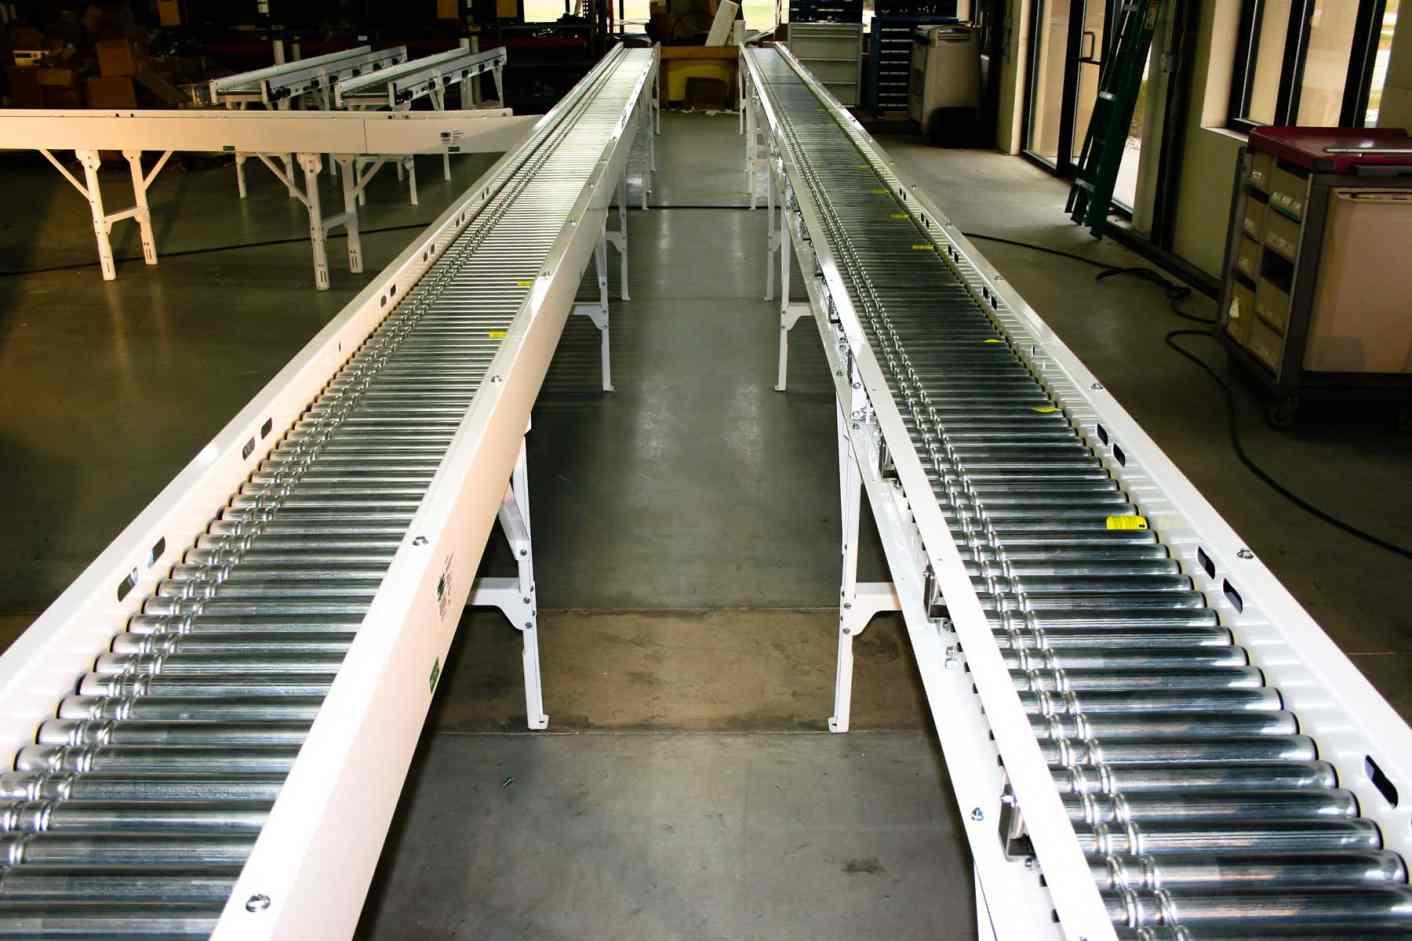 Robinson motor driven roller conveyors